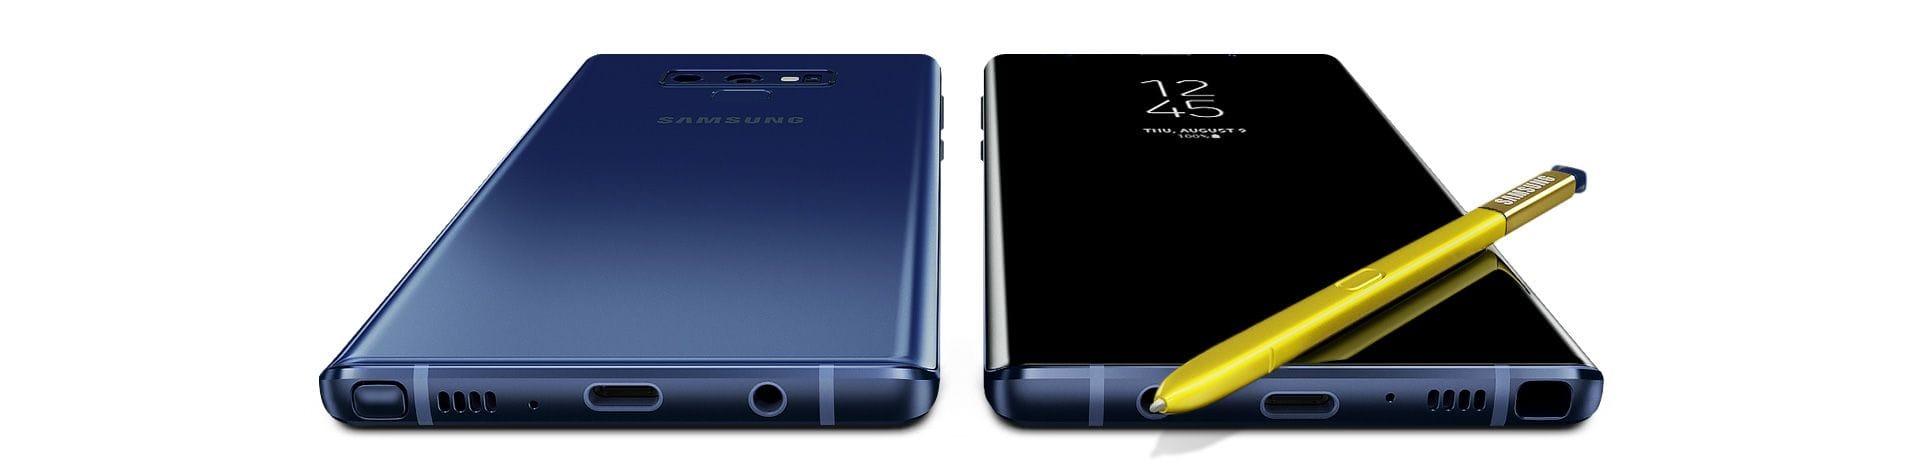 Samsung Galaxy Note9 angle